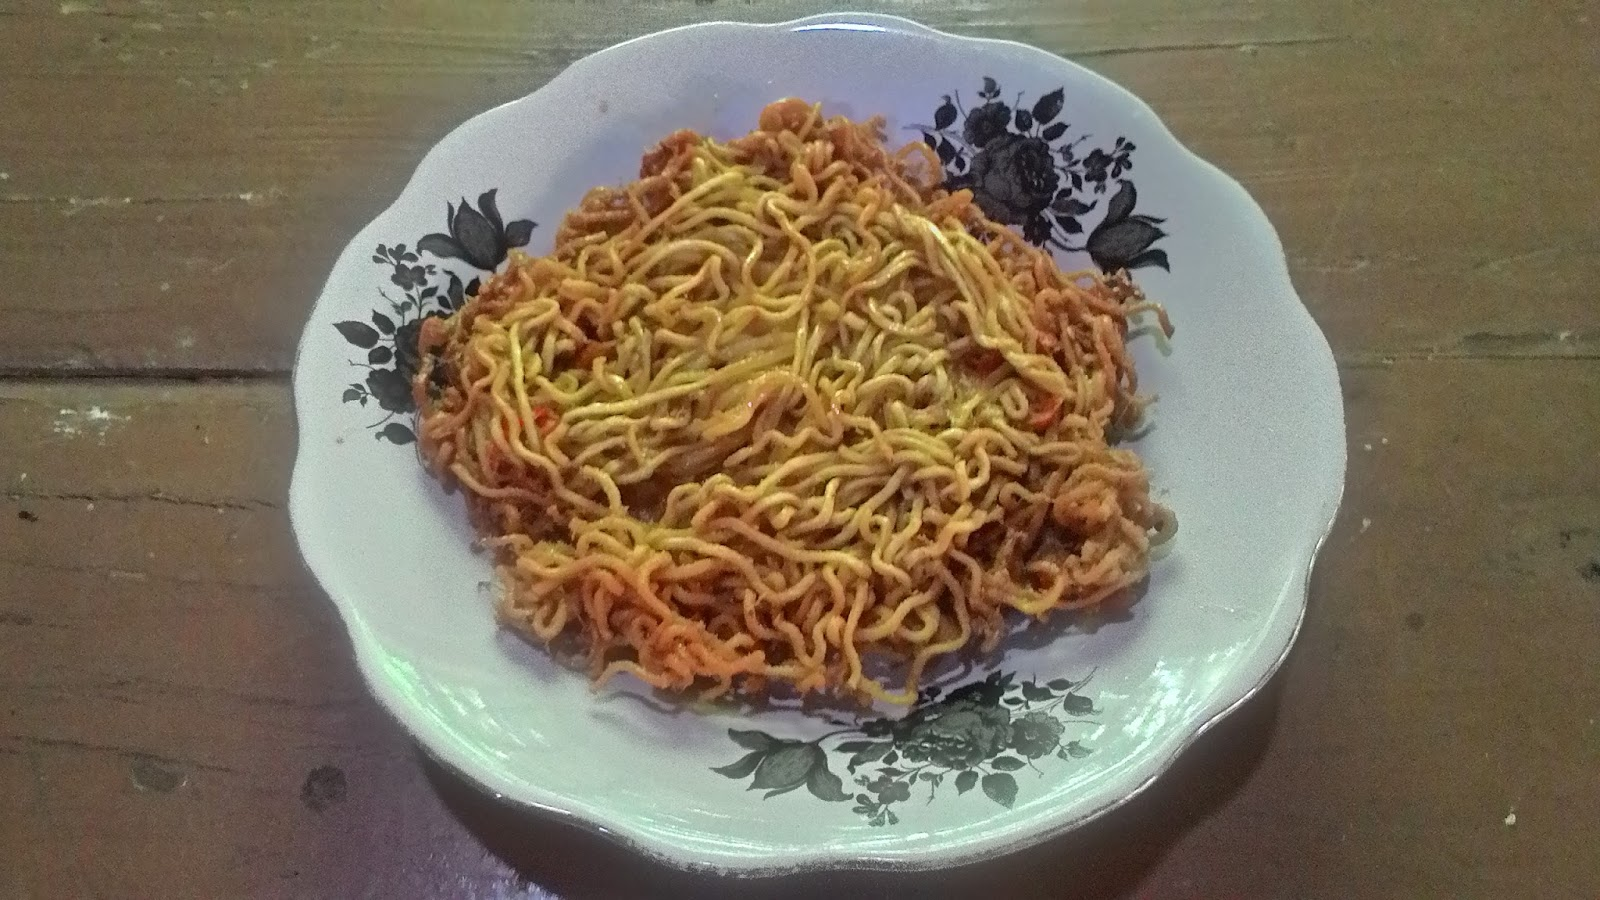 Resep Cara Membuat Omelet Mie Ala Kang Yuli